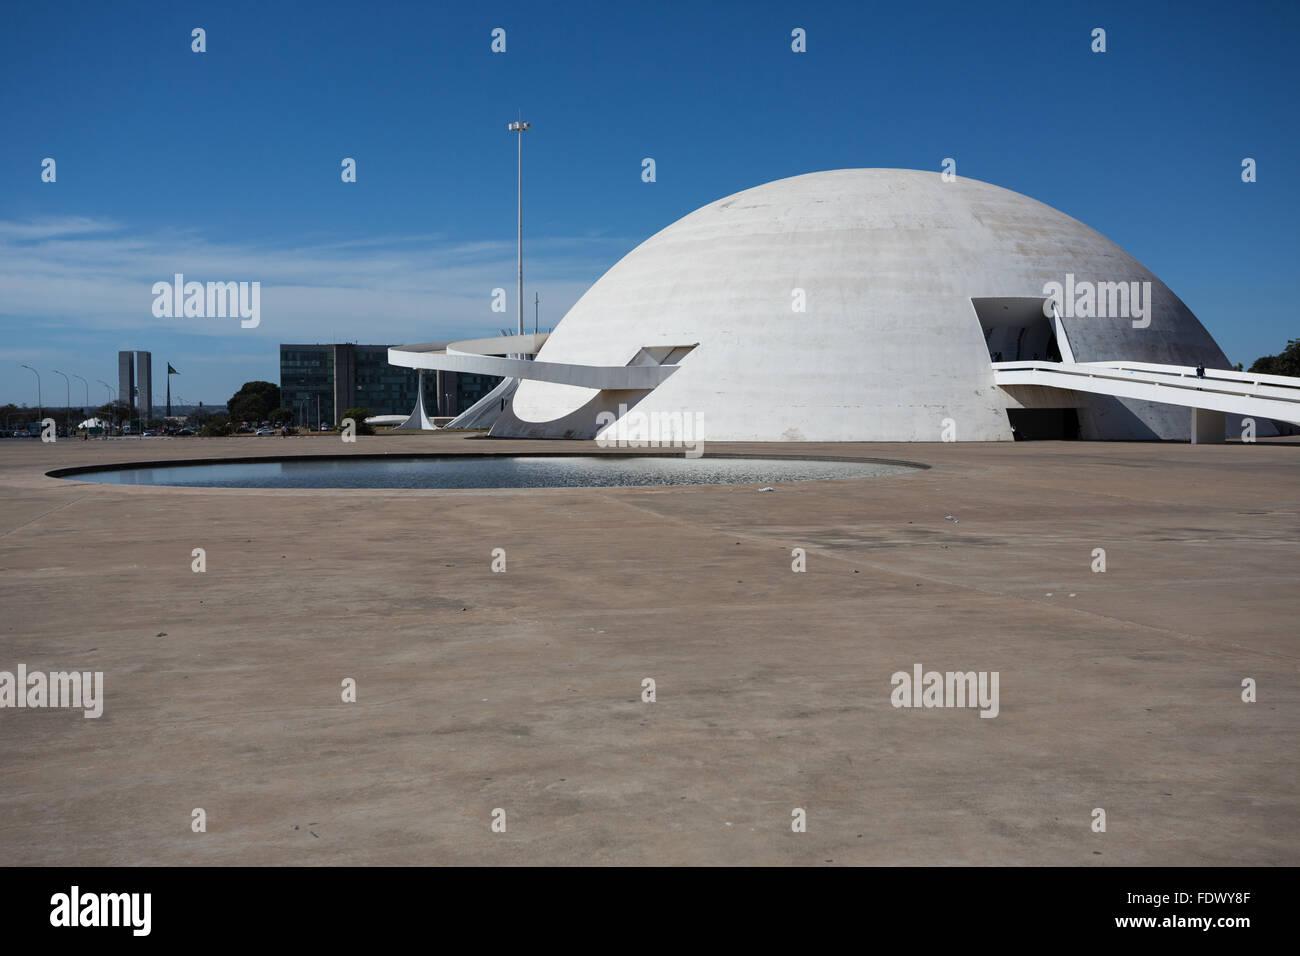 Nationalmuseum der Republik in Brasilia, Hauptstadt von Brasilien Stockbild